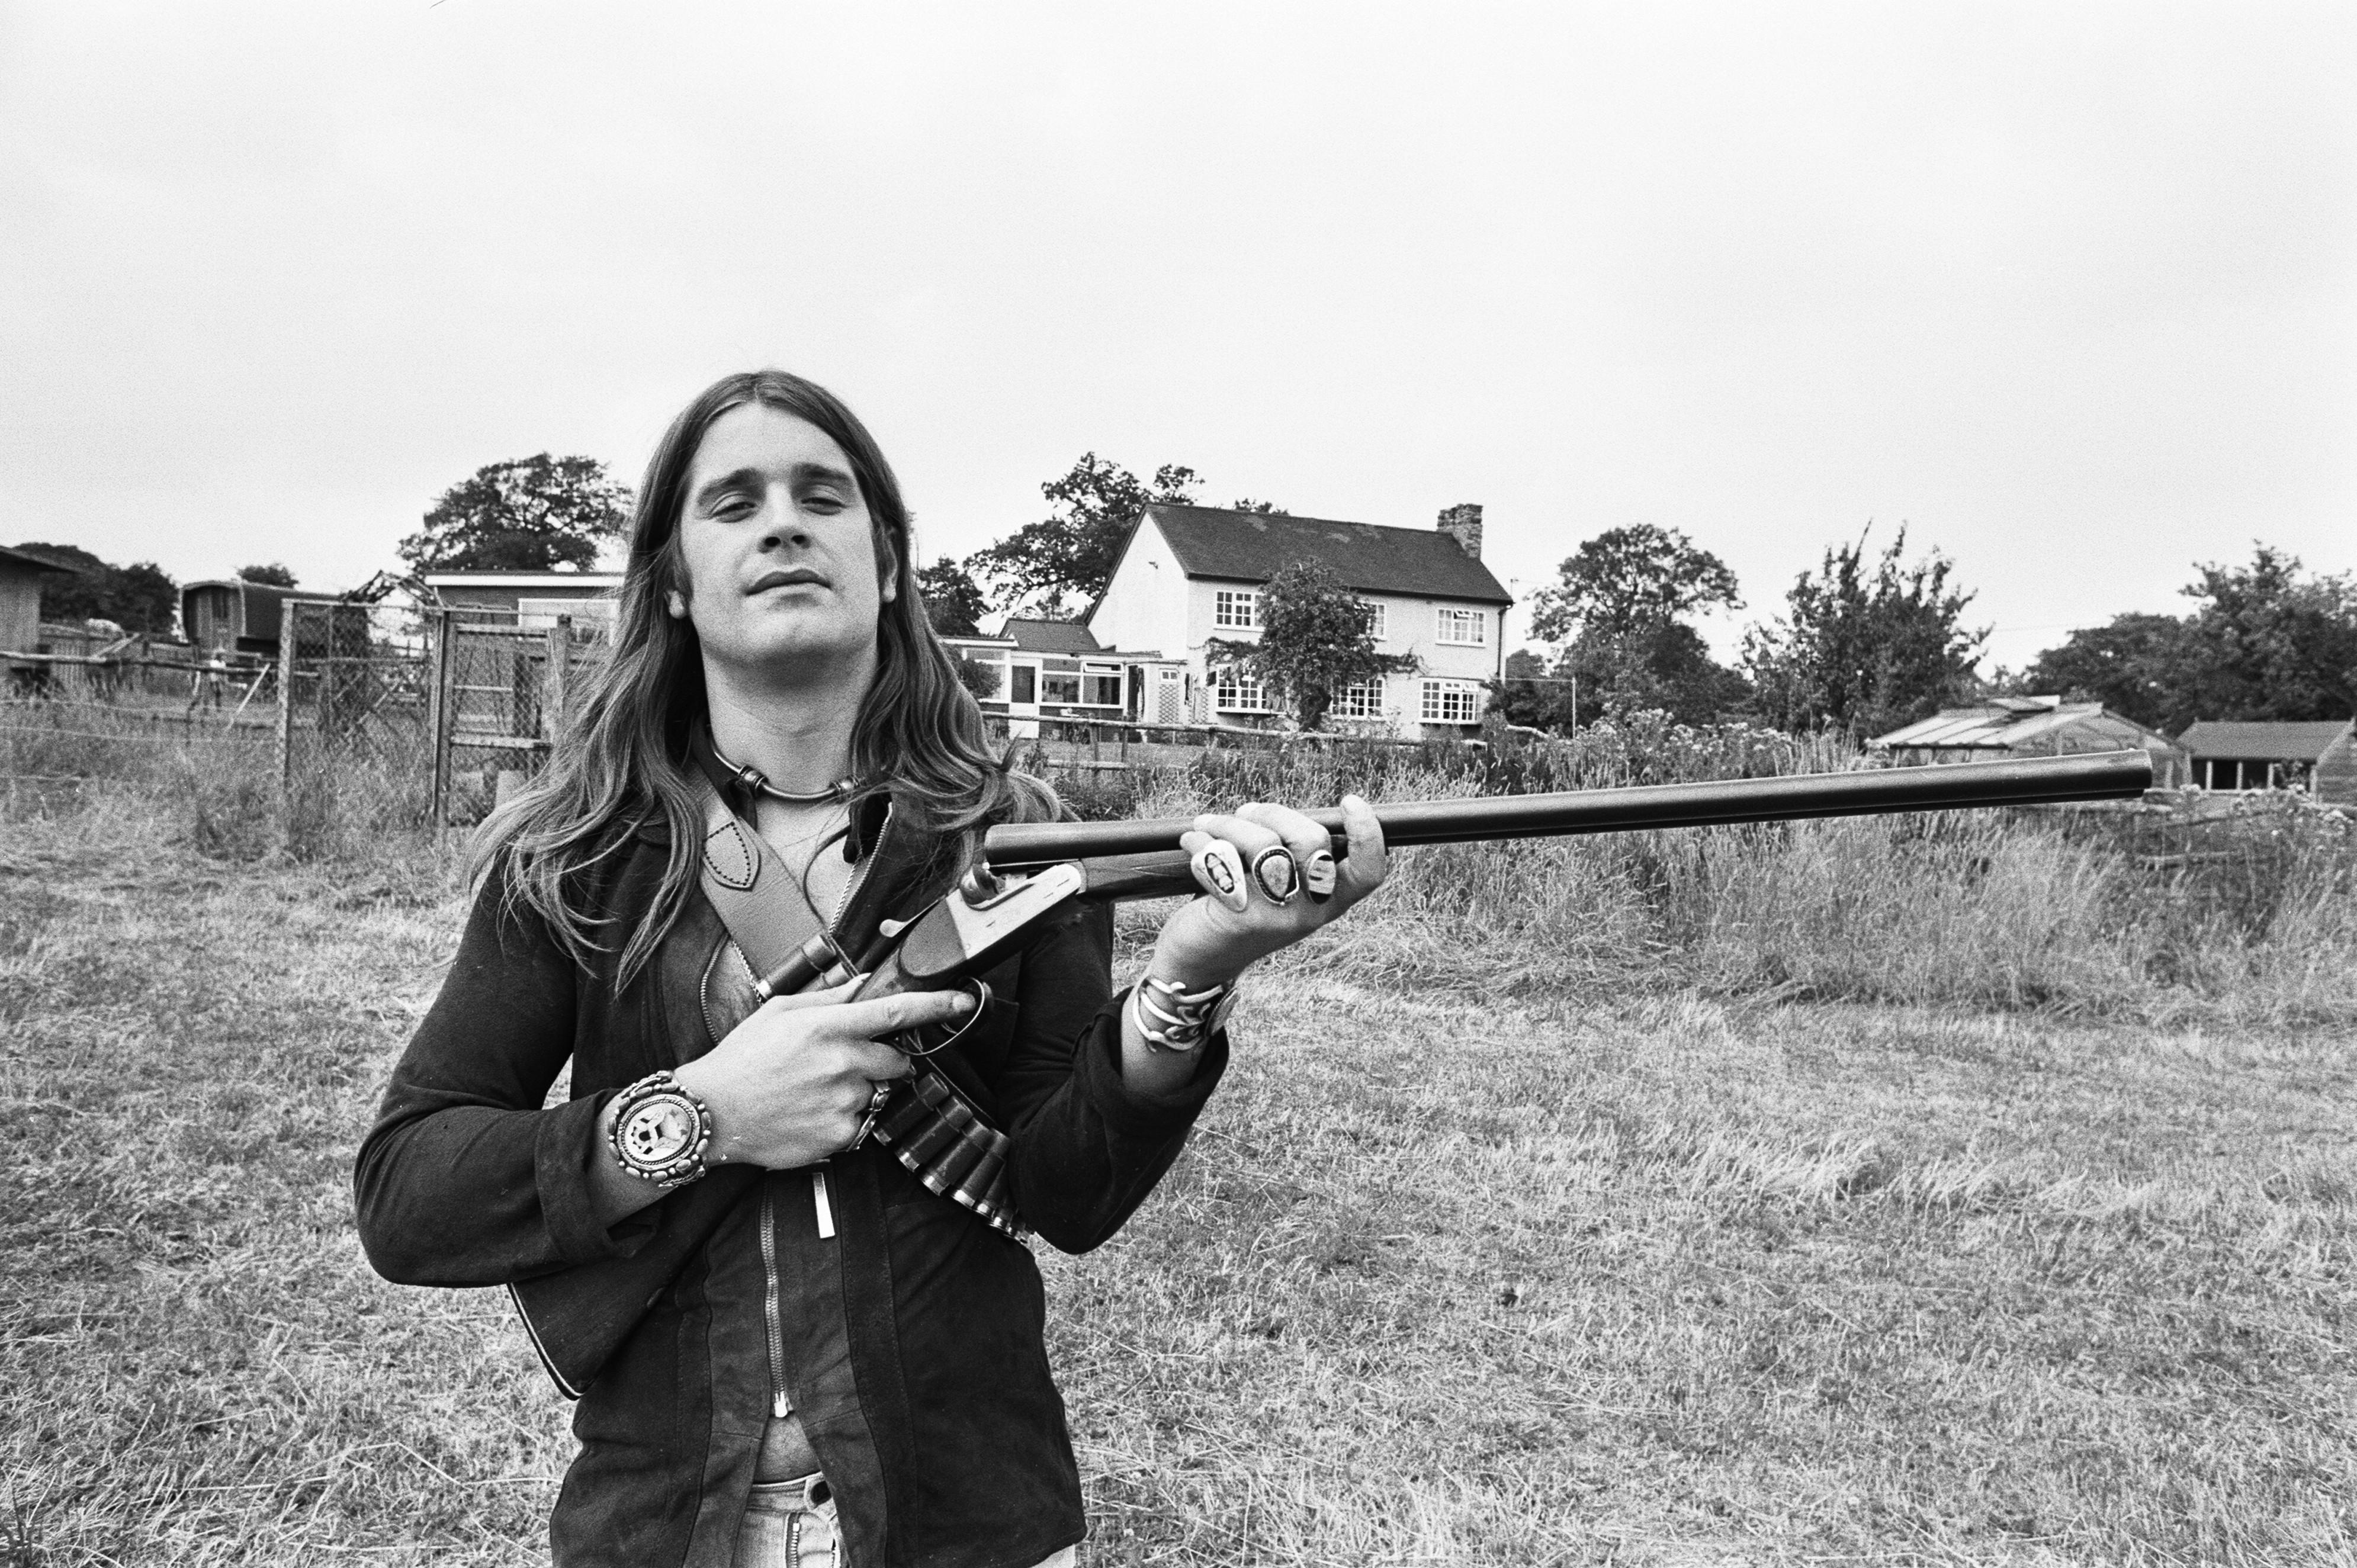 black_sabbath_ozzy_osbourne_with_a_shotgun_at_home_1976_poster_h_00530893_1.jpg